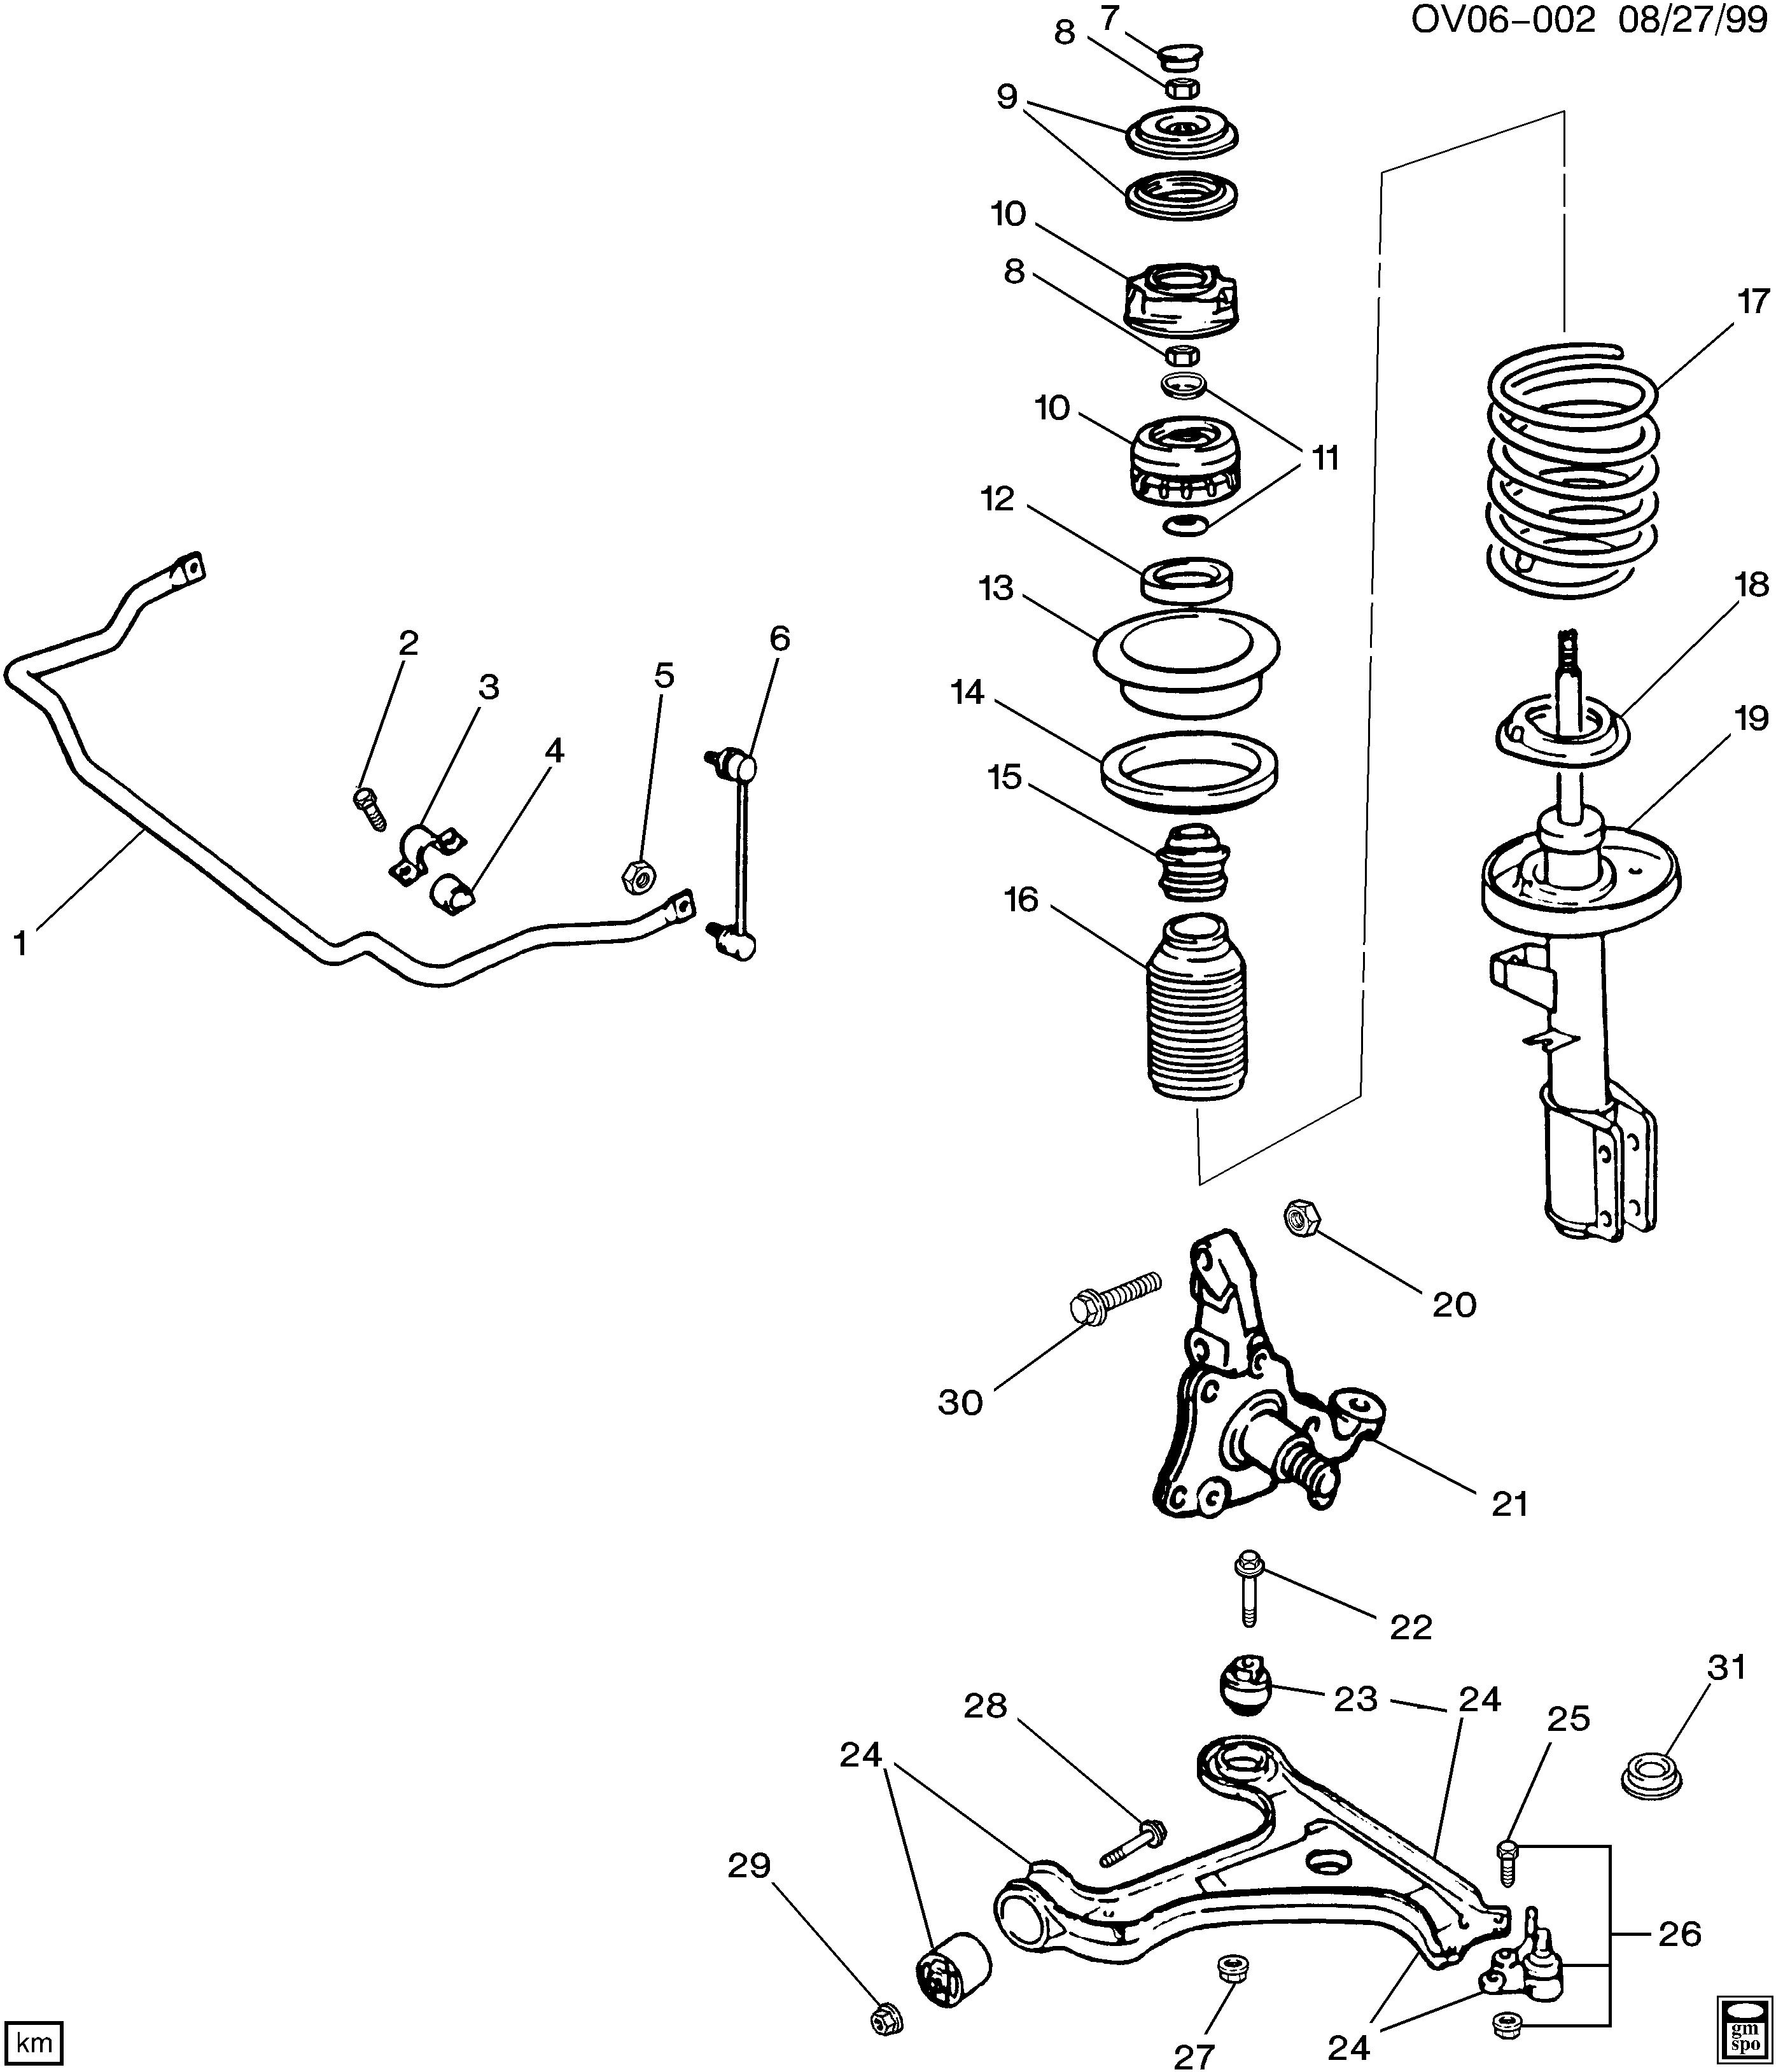 cadillac catera parts catalog